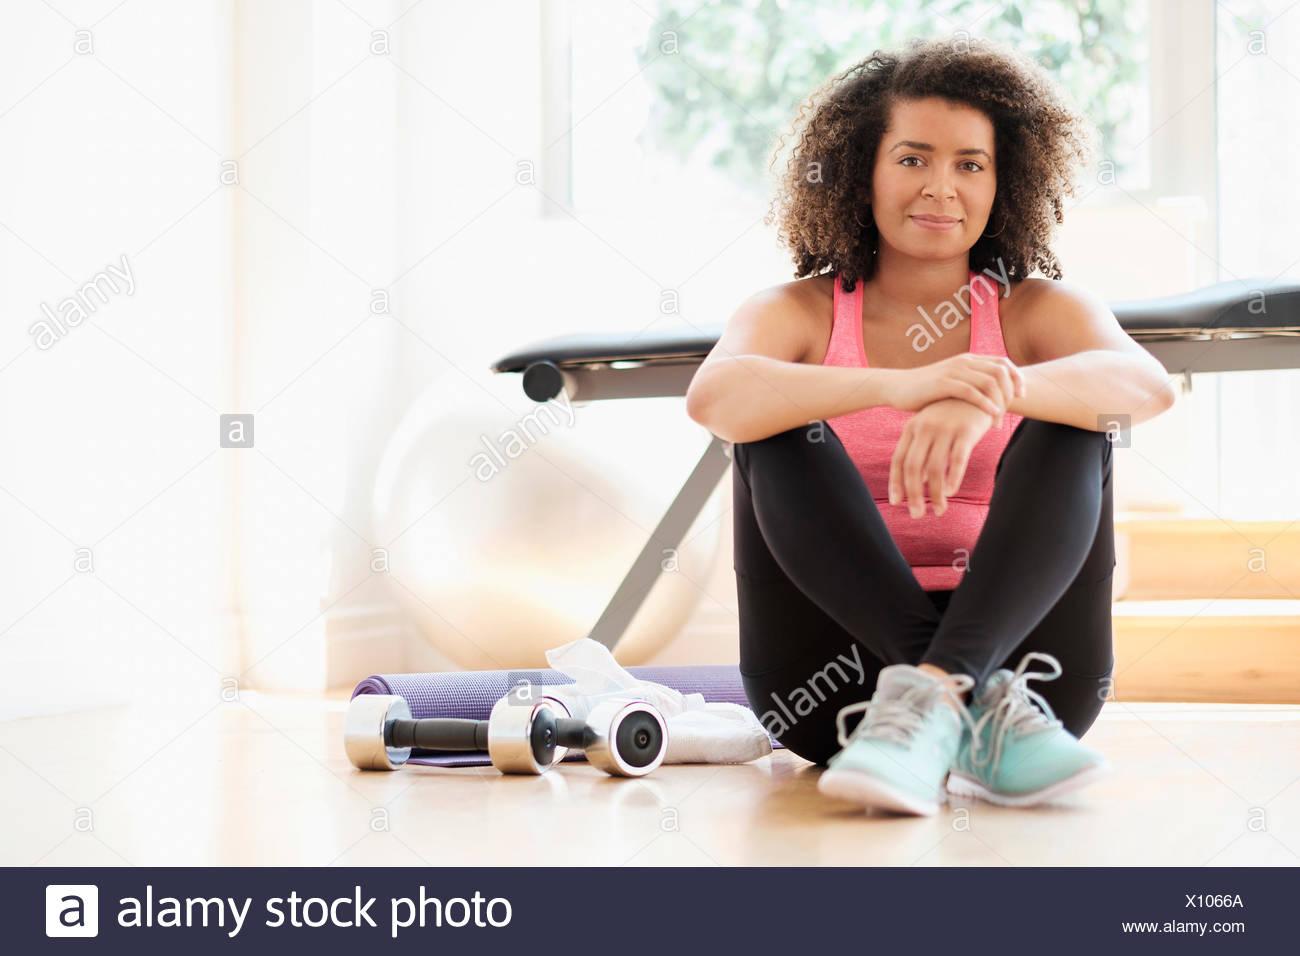 Retrato de mujer joven de gimnasio Imagen De Stock